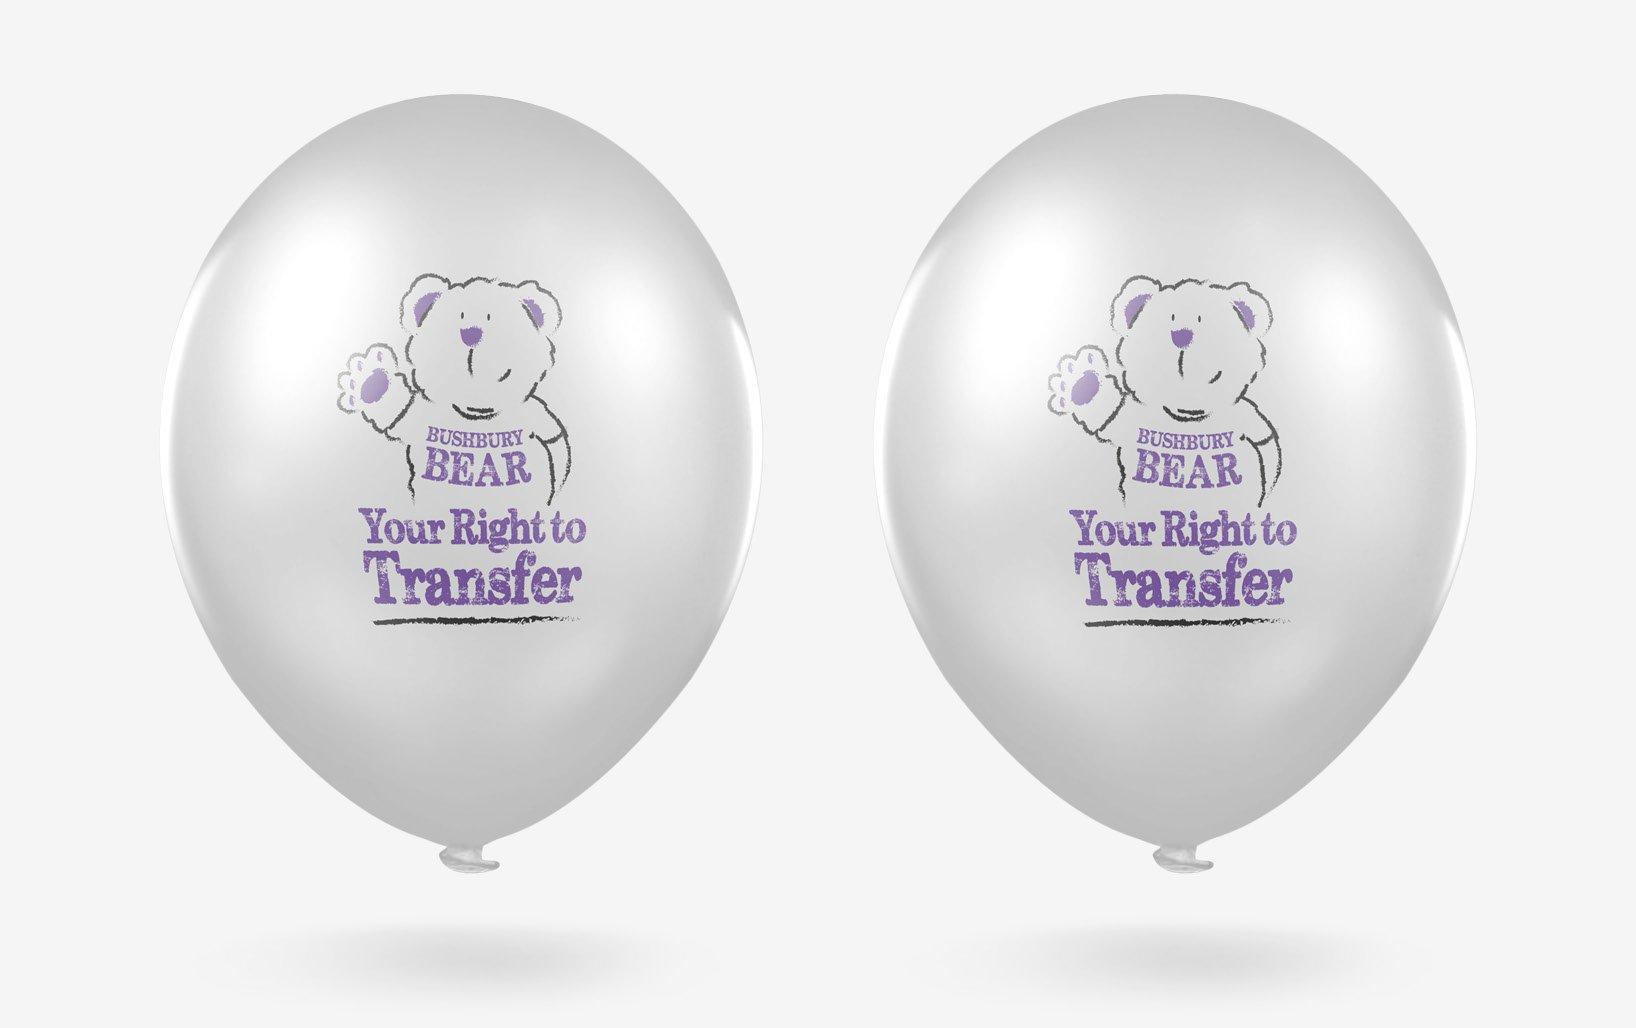 Bushbury promotional balloons